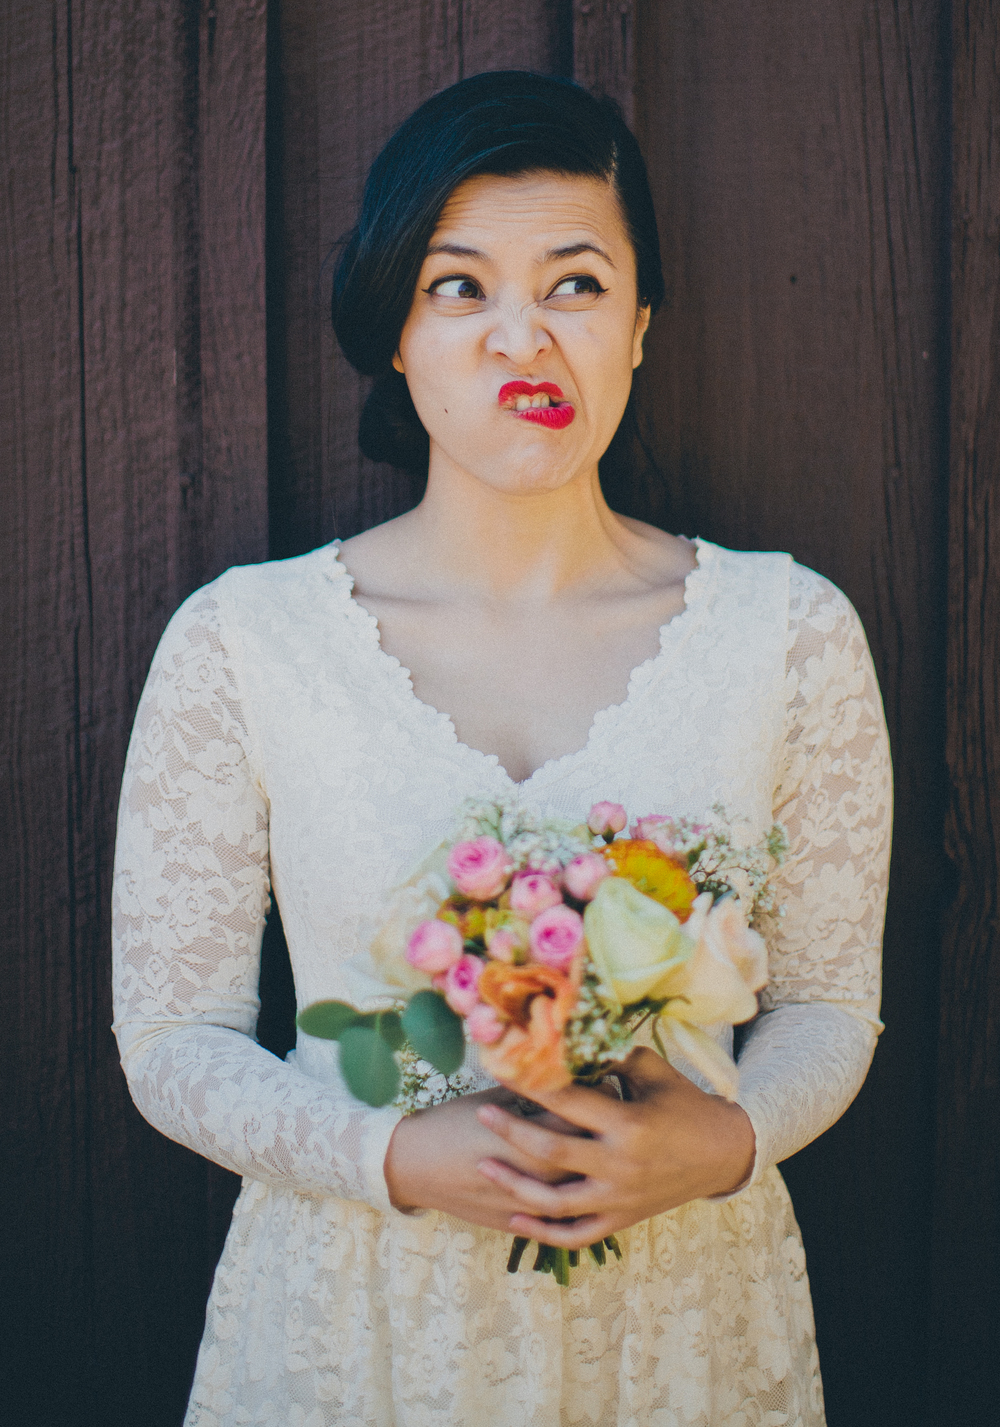 ica_images_tim_wedding_bay_im_kristen_DIY_maryland_photography80of218.jpg~original.jpeg